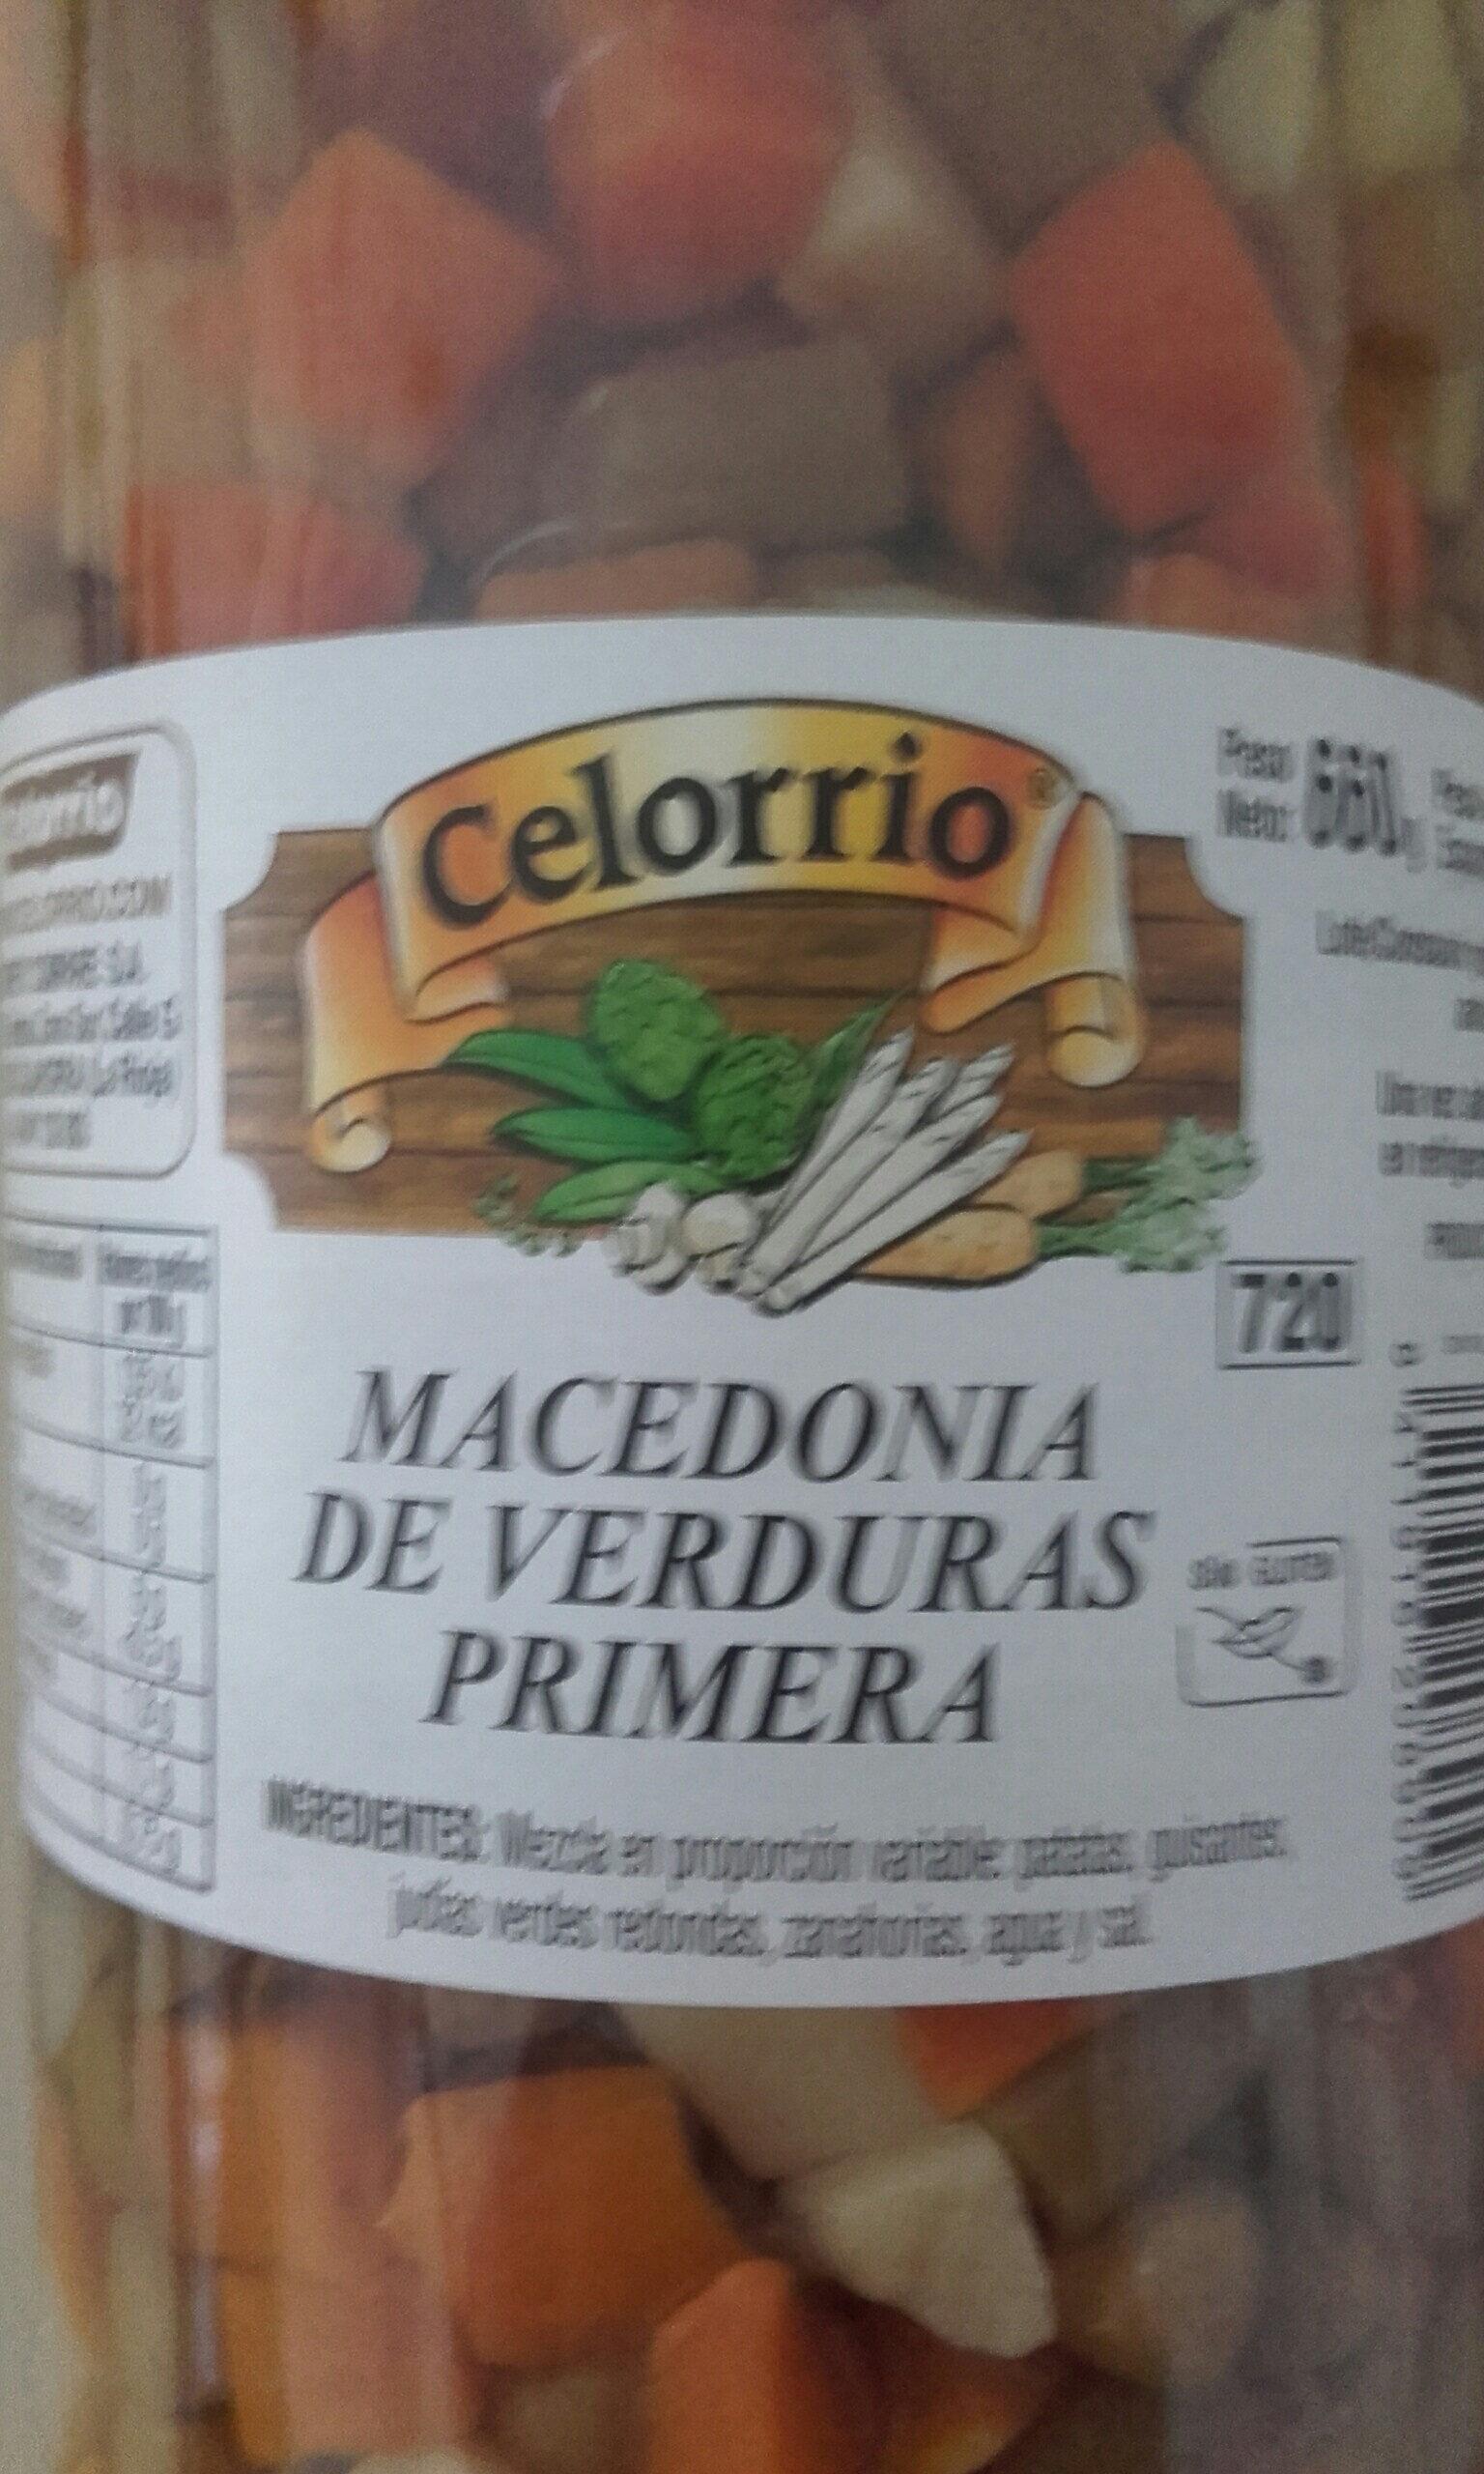 Macedonia verduras - Ingredients